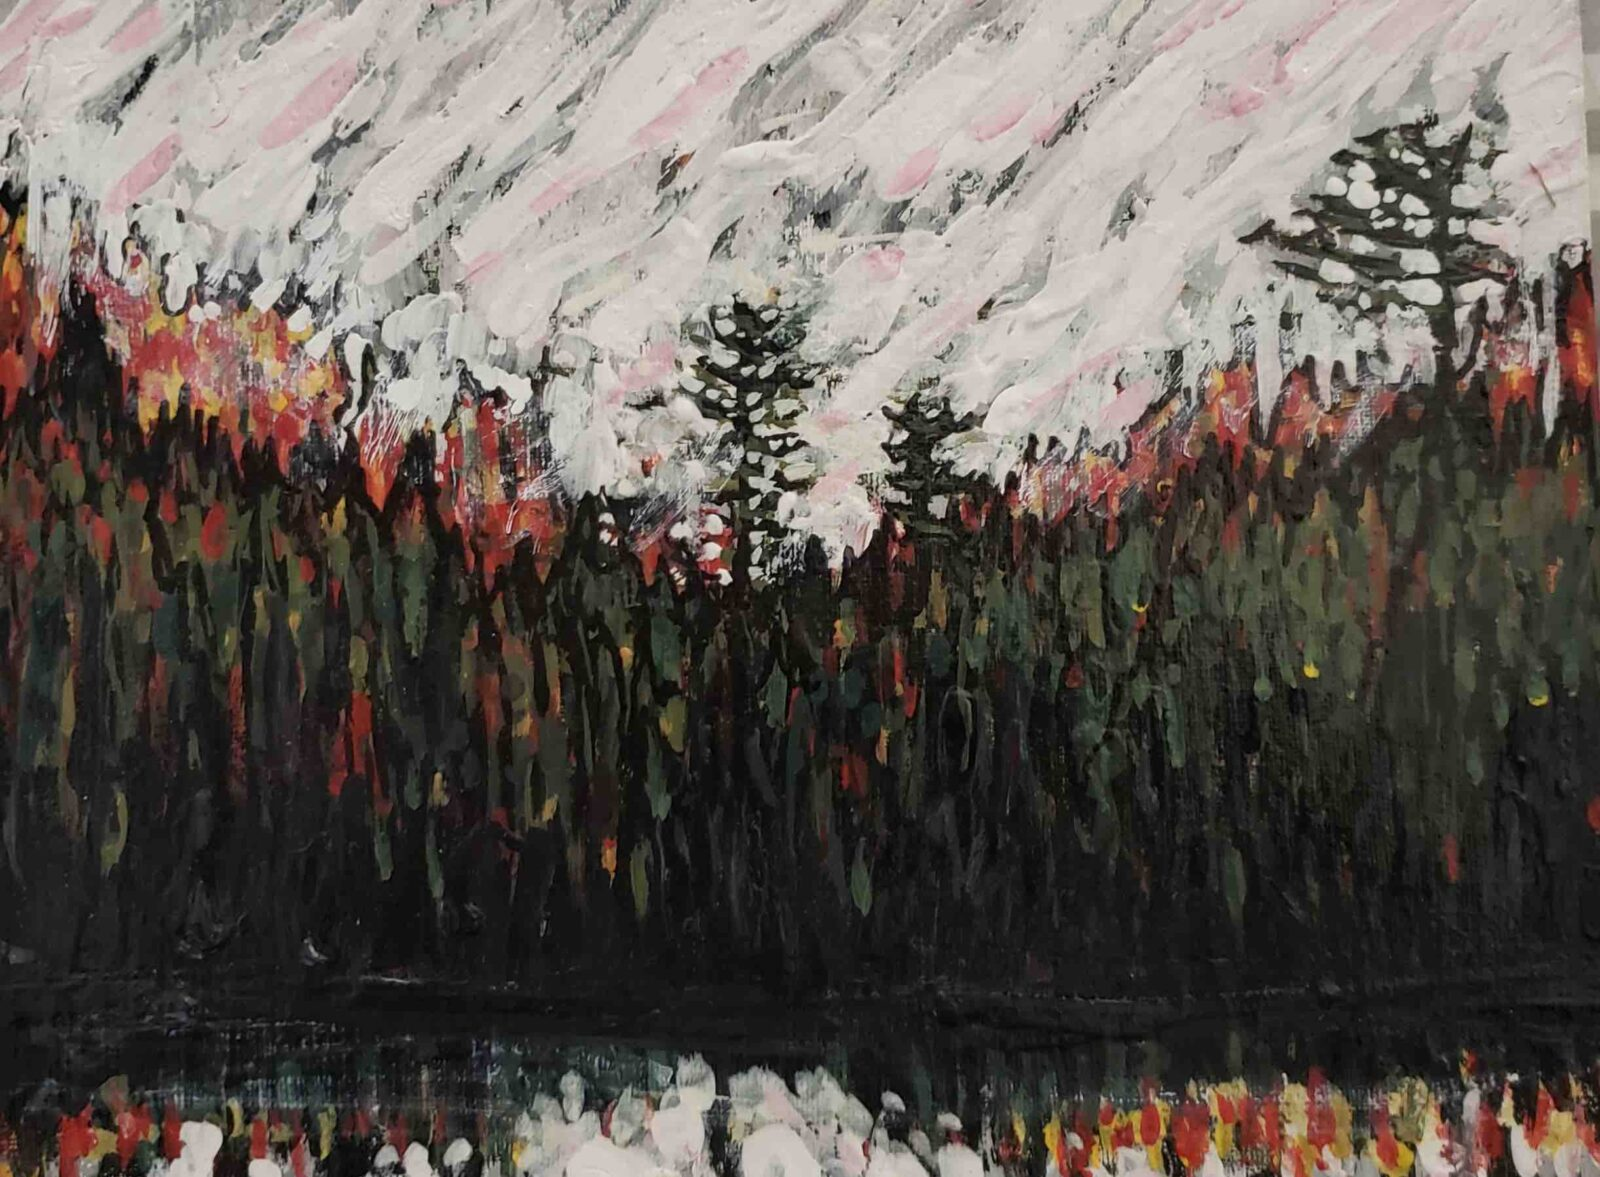 Muskoka Art Events painting of trees and lake